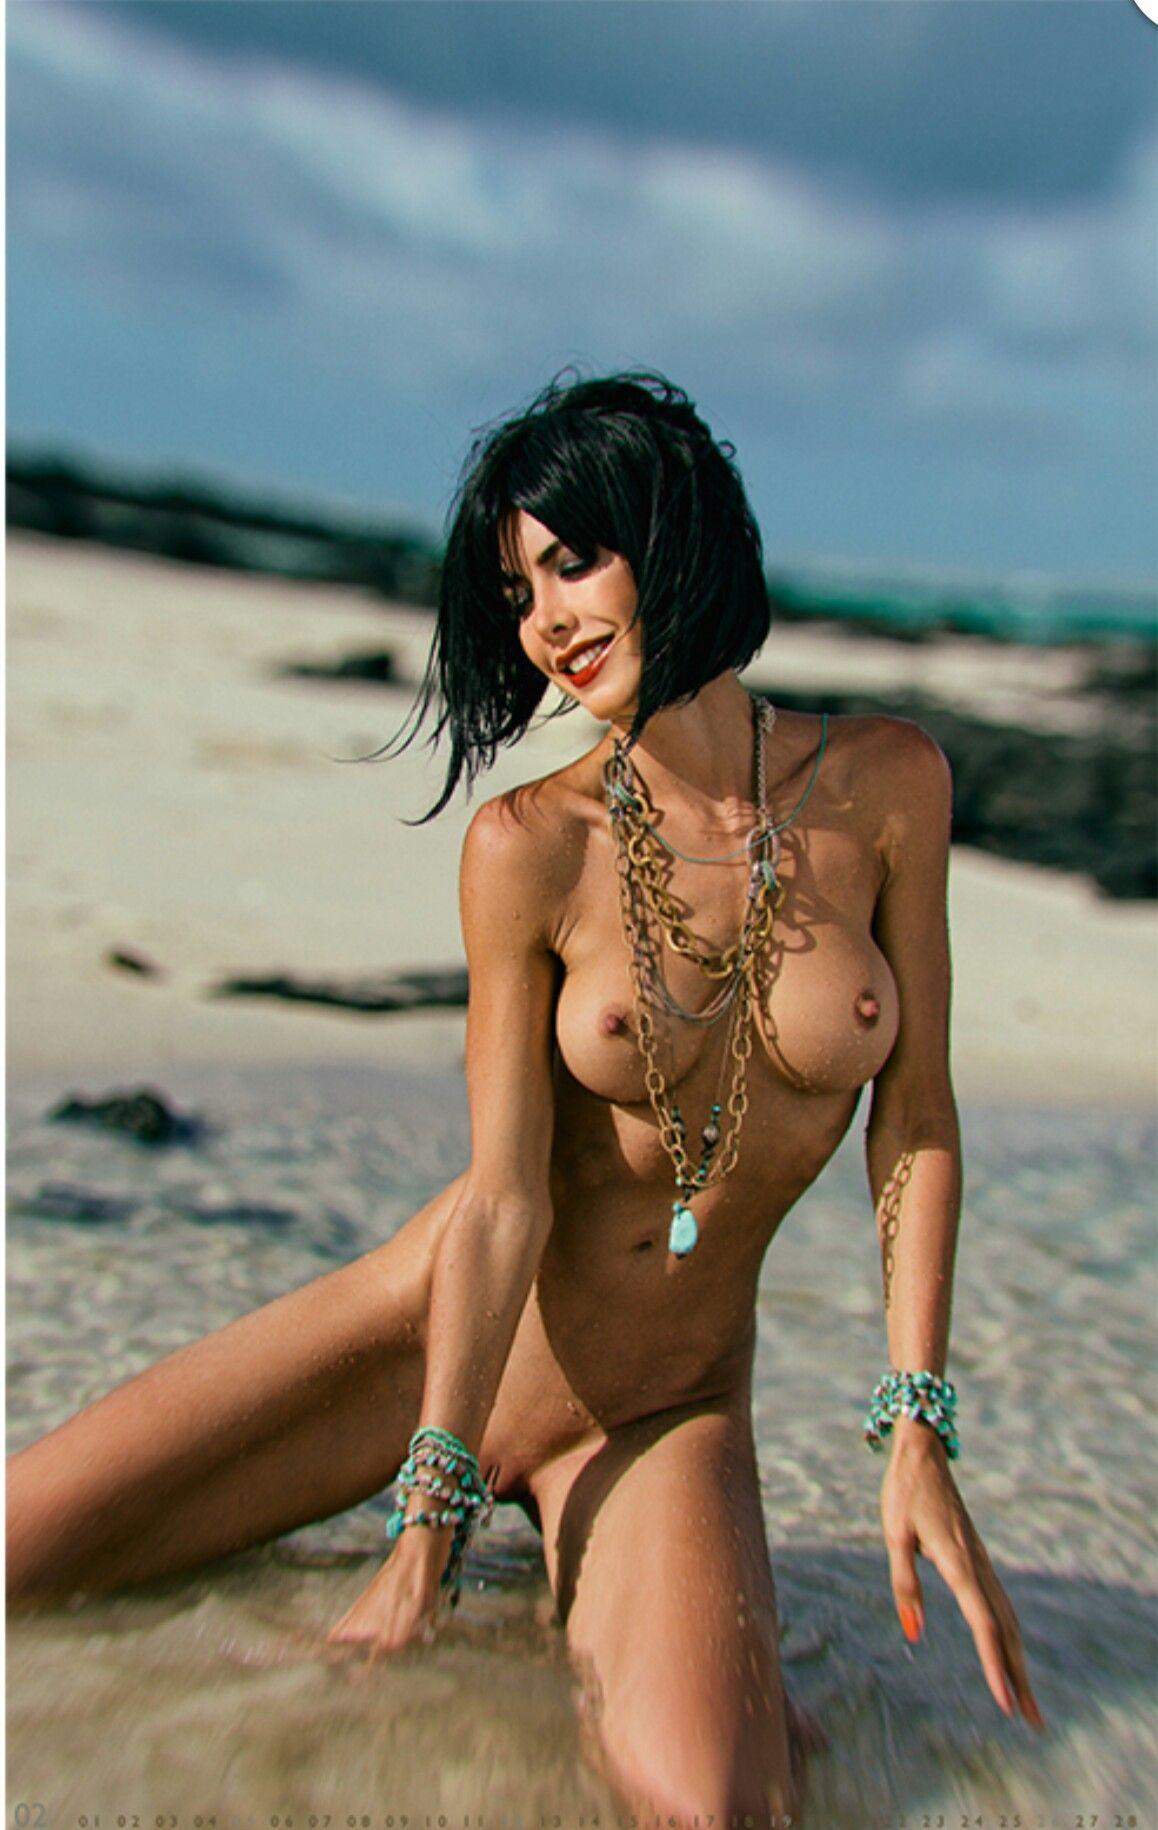 nudes (82 photo), Bikini Celebrity image